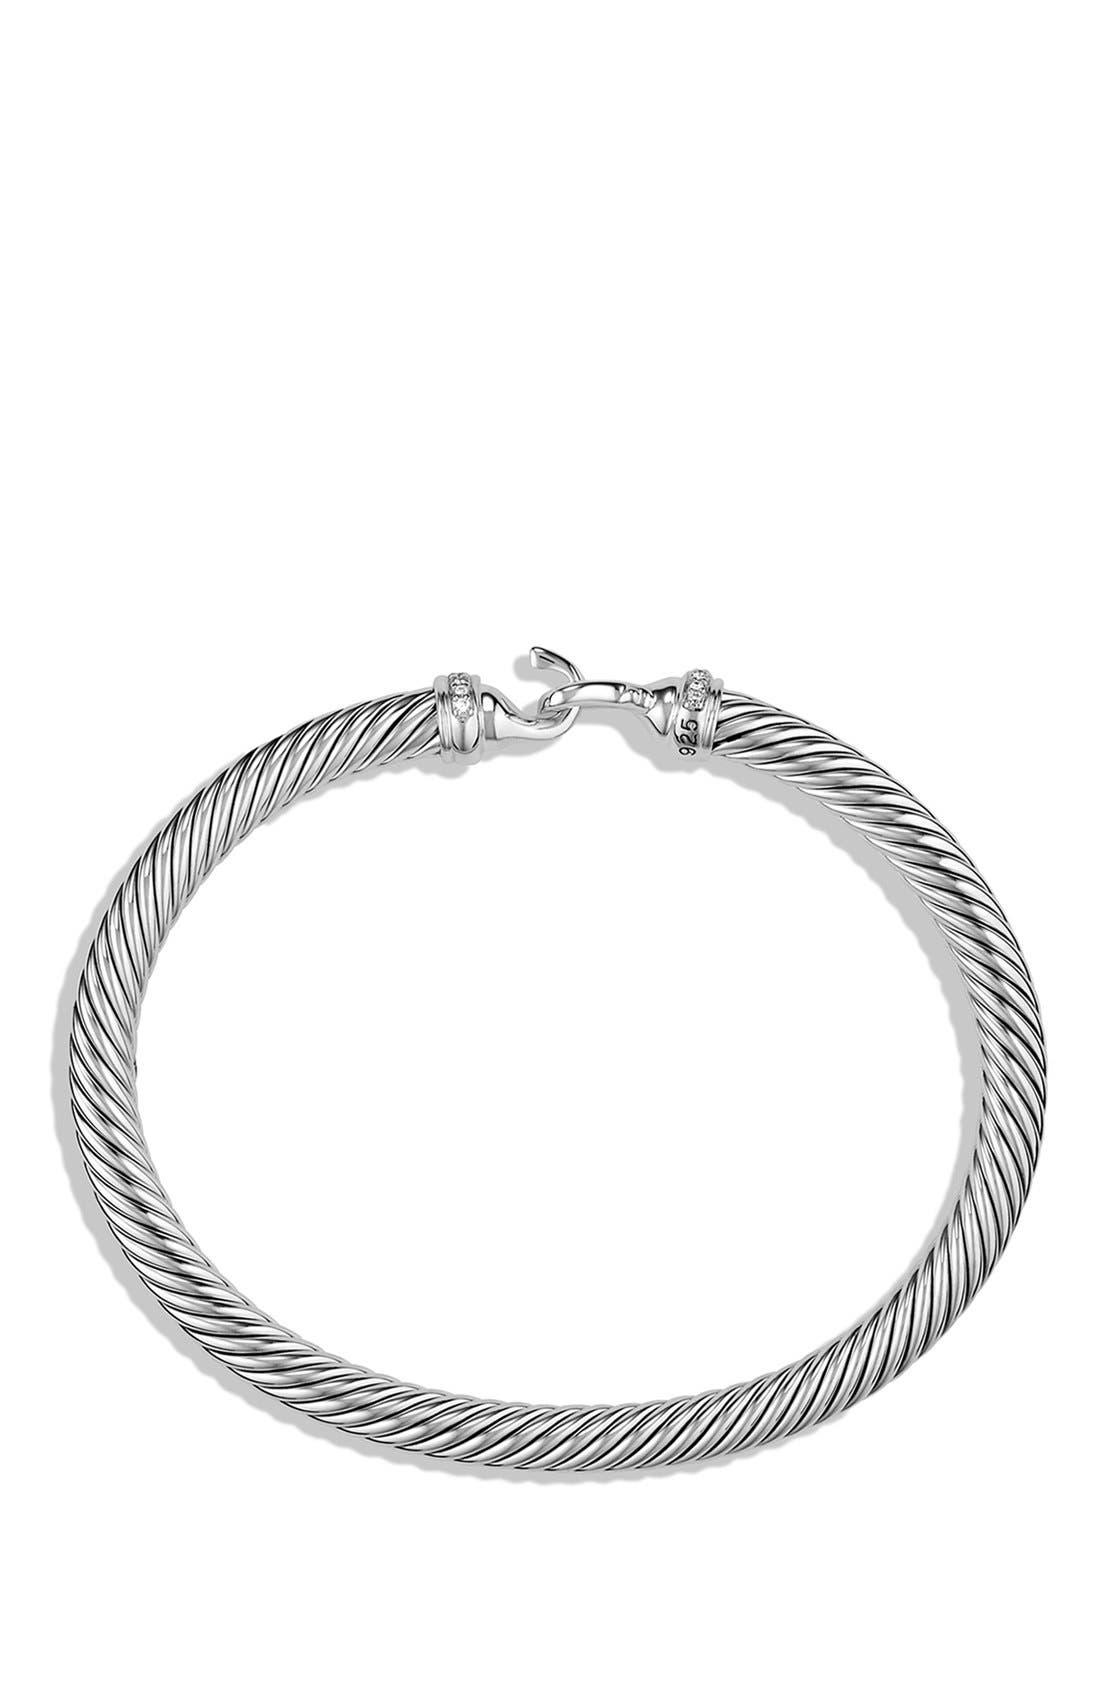 DAVID YURMAN, Cable Buckle Bracelet with Diamonds, 5mm, Alternate thumbnail 3, color, DIAMOND